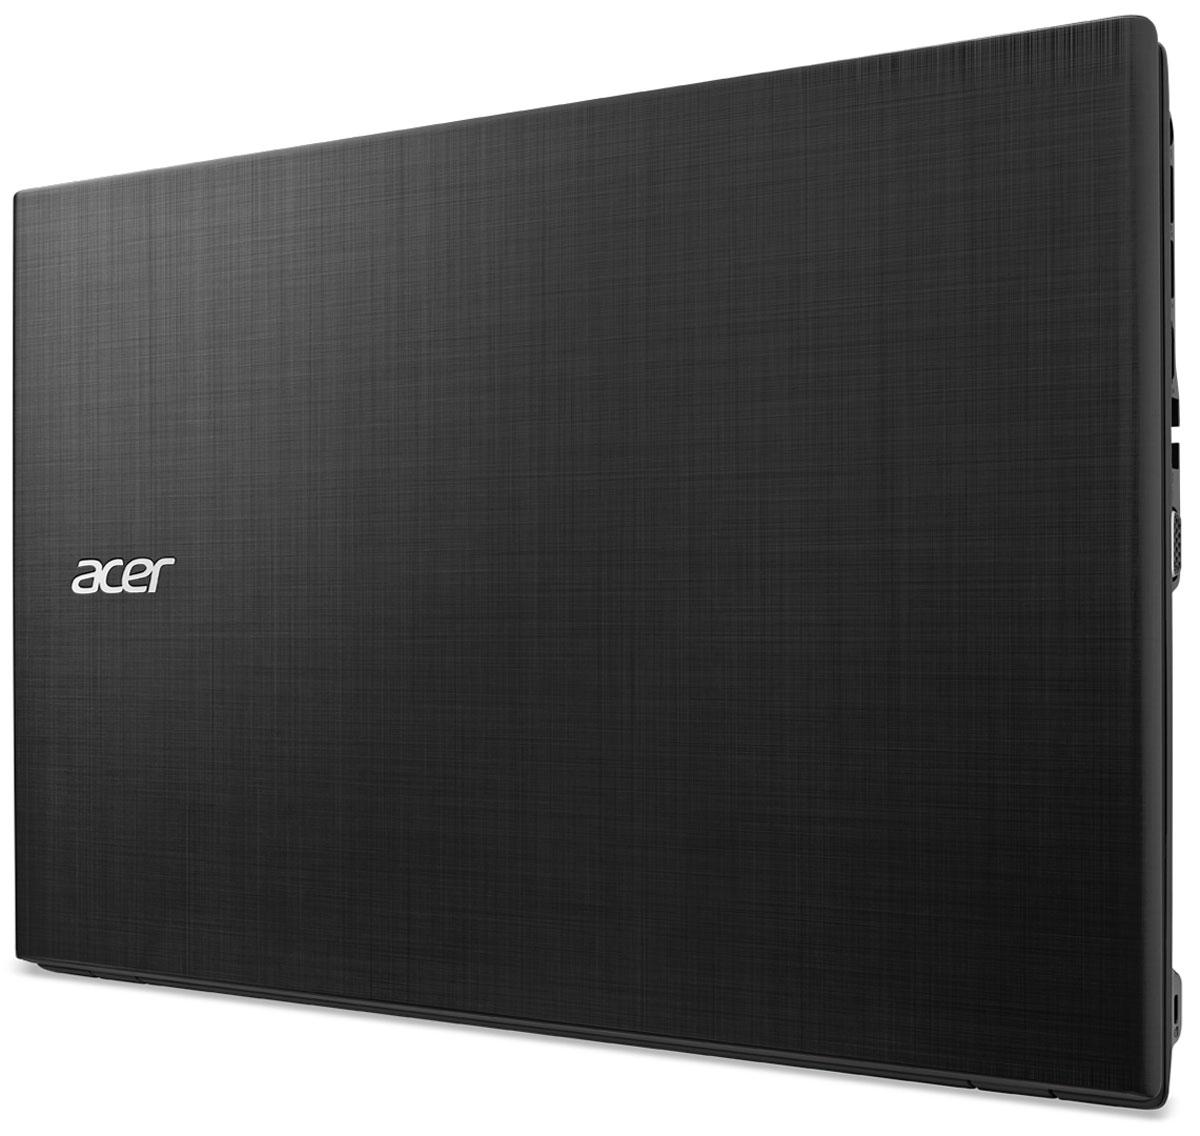 Acer Aspire F5-571G-P8PJ, Black (NX.GA2ER.005)